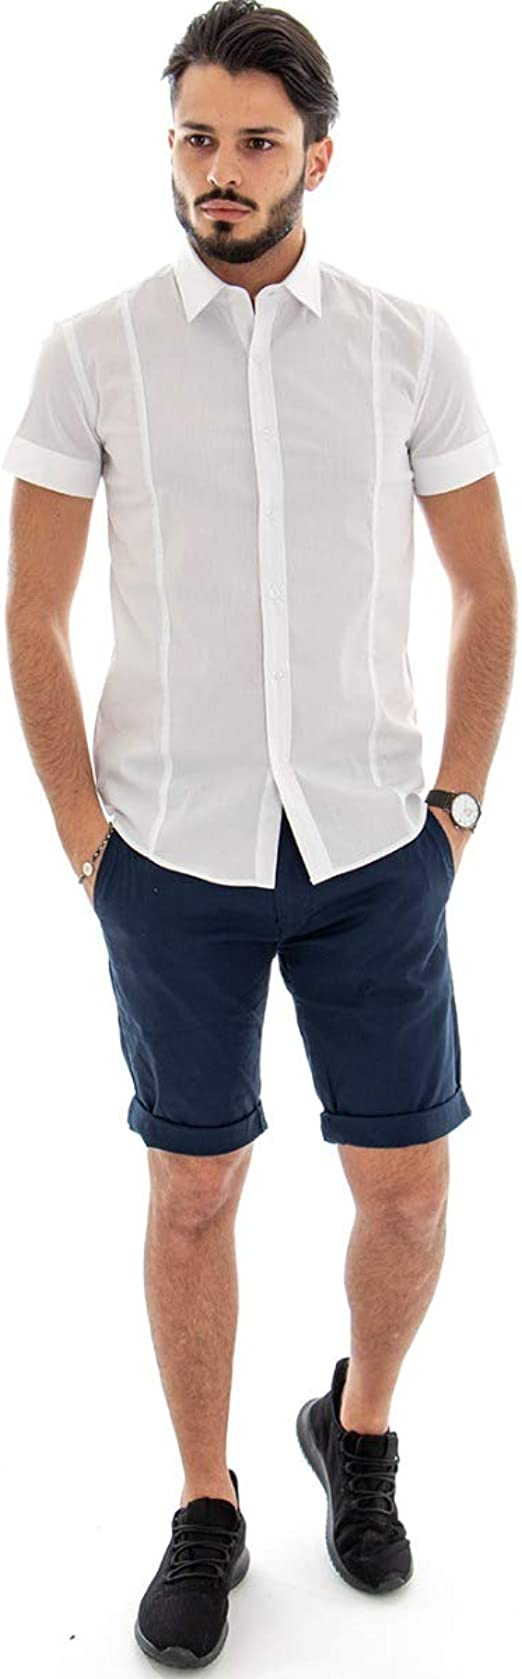 Giosal Outfit - Camisa de Manga Corta para Hombre, Color ...